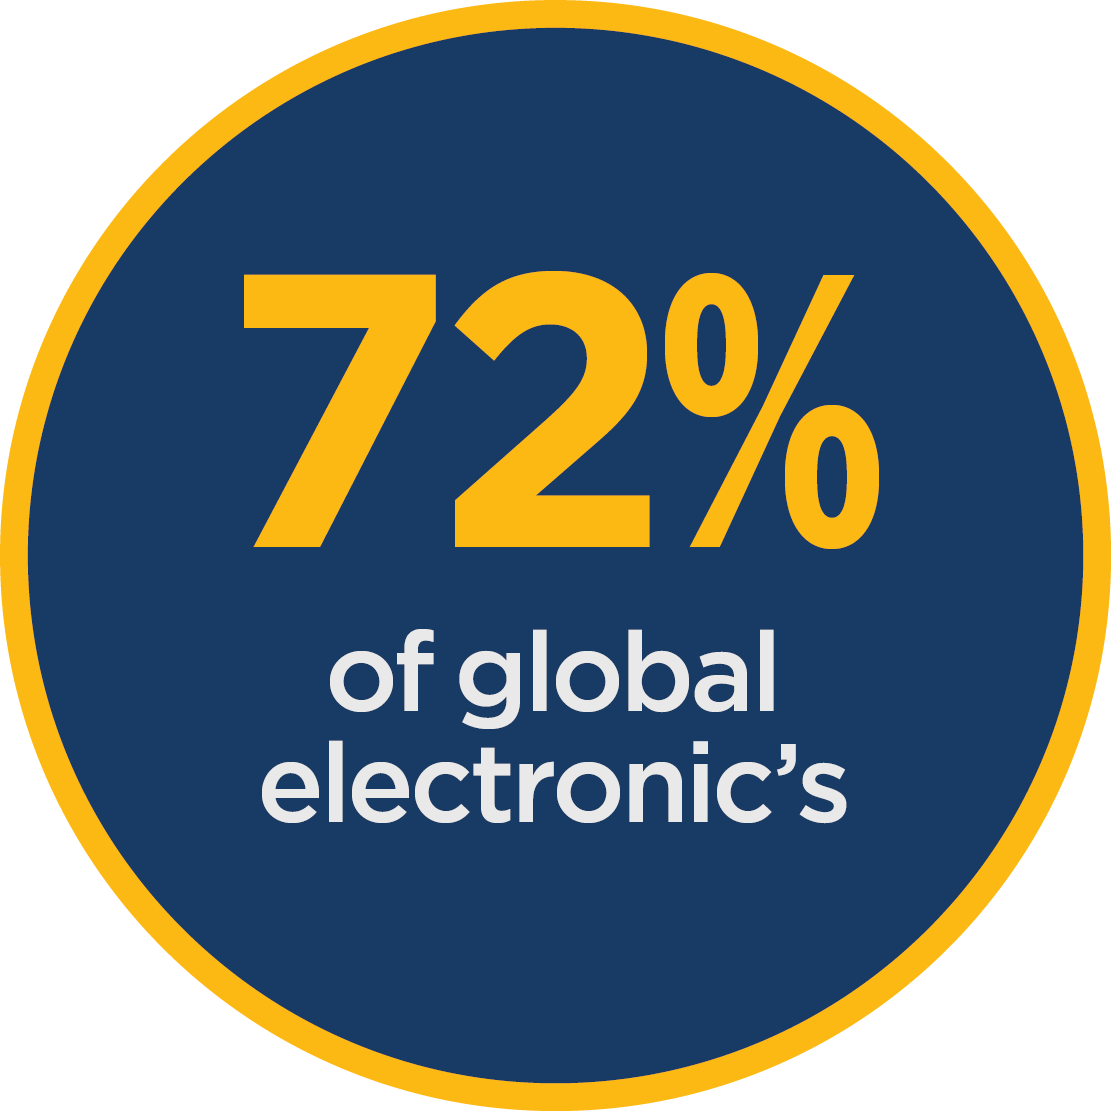 72% of global electronic's